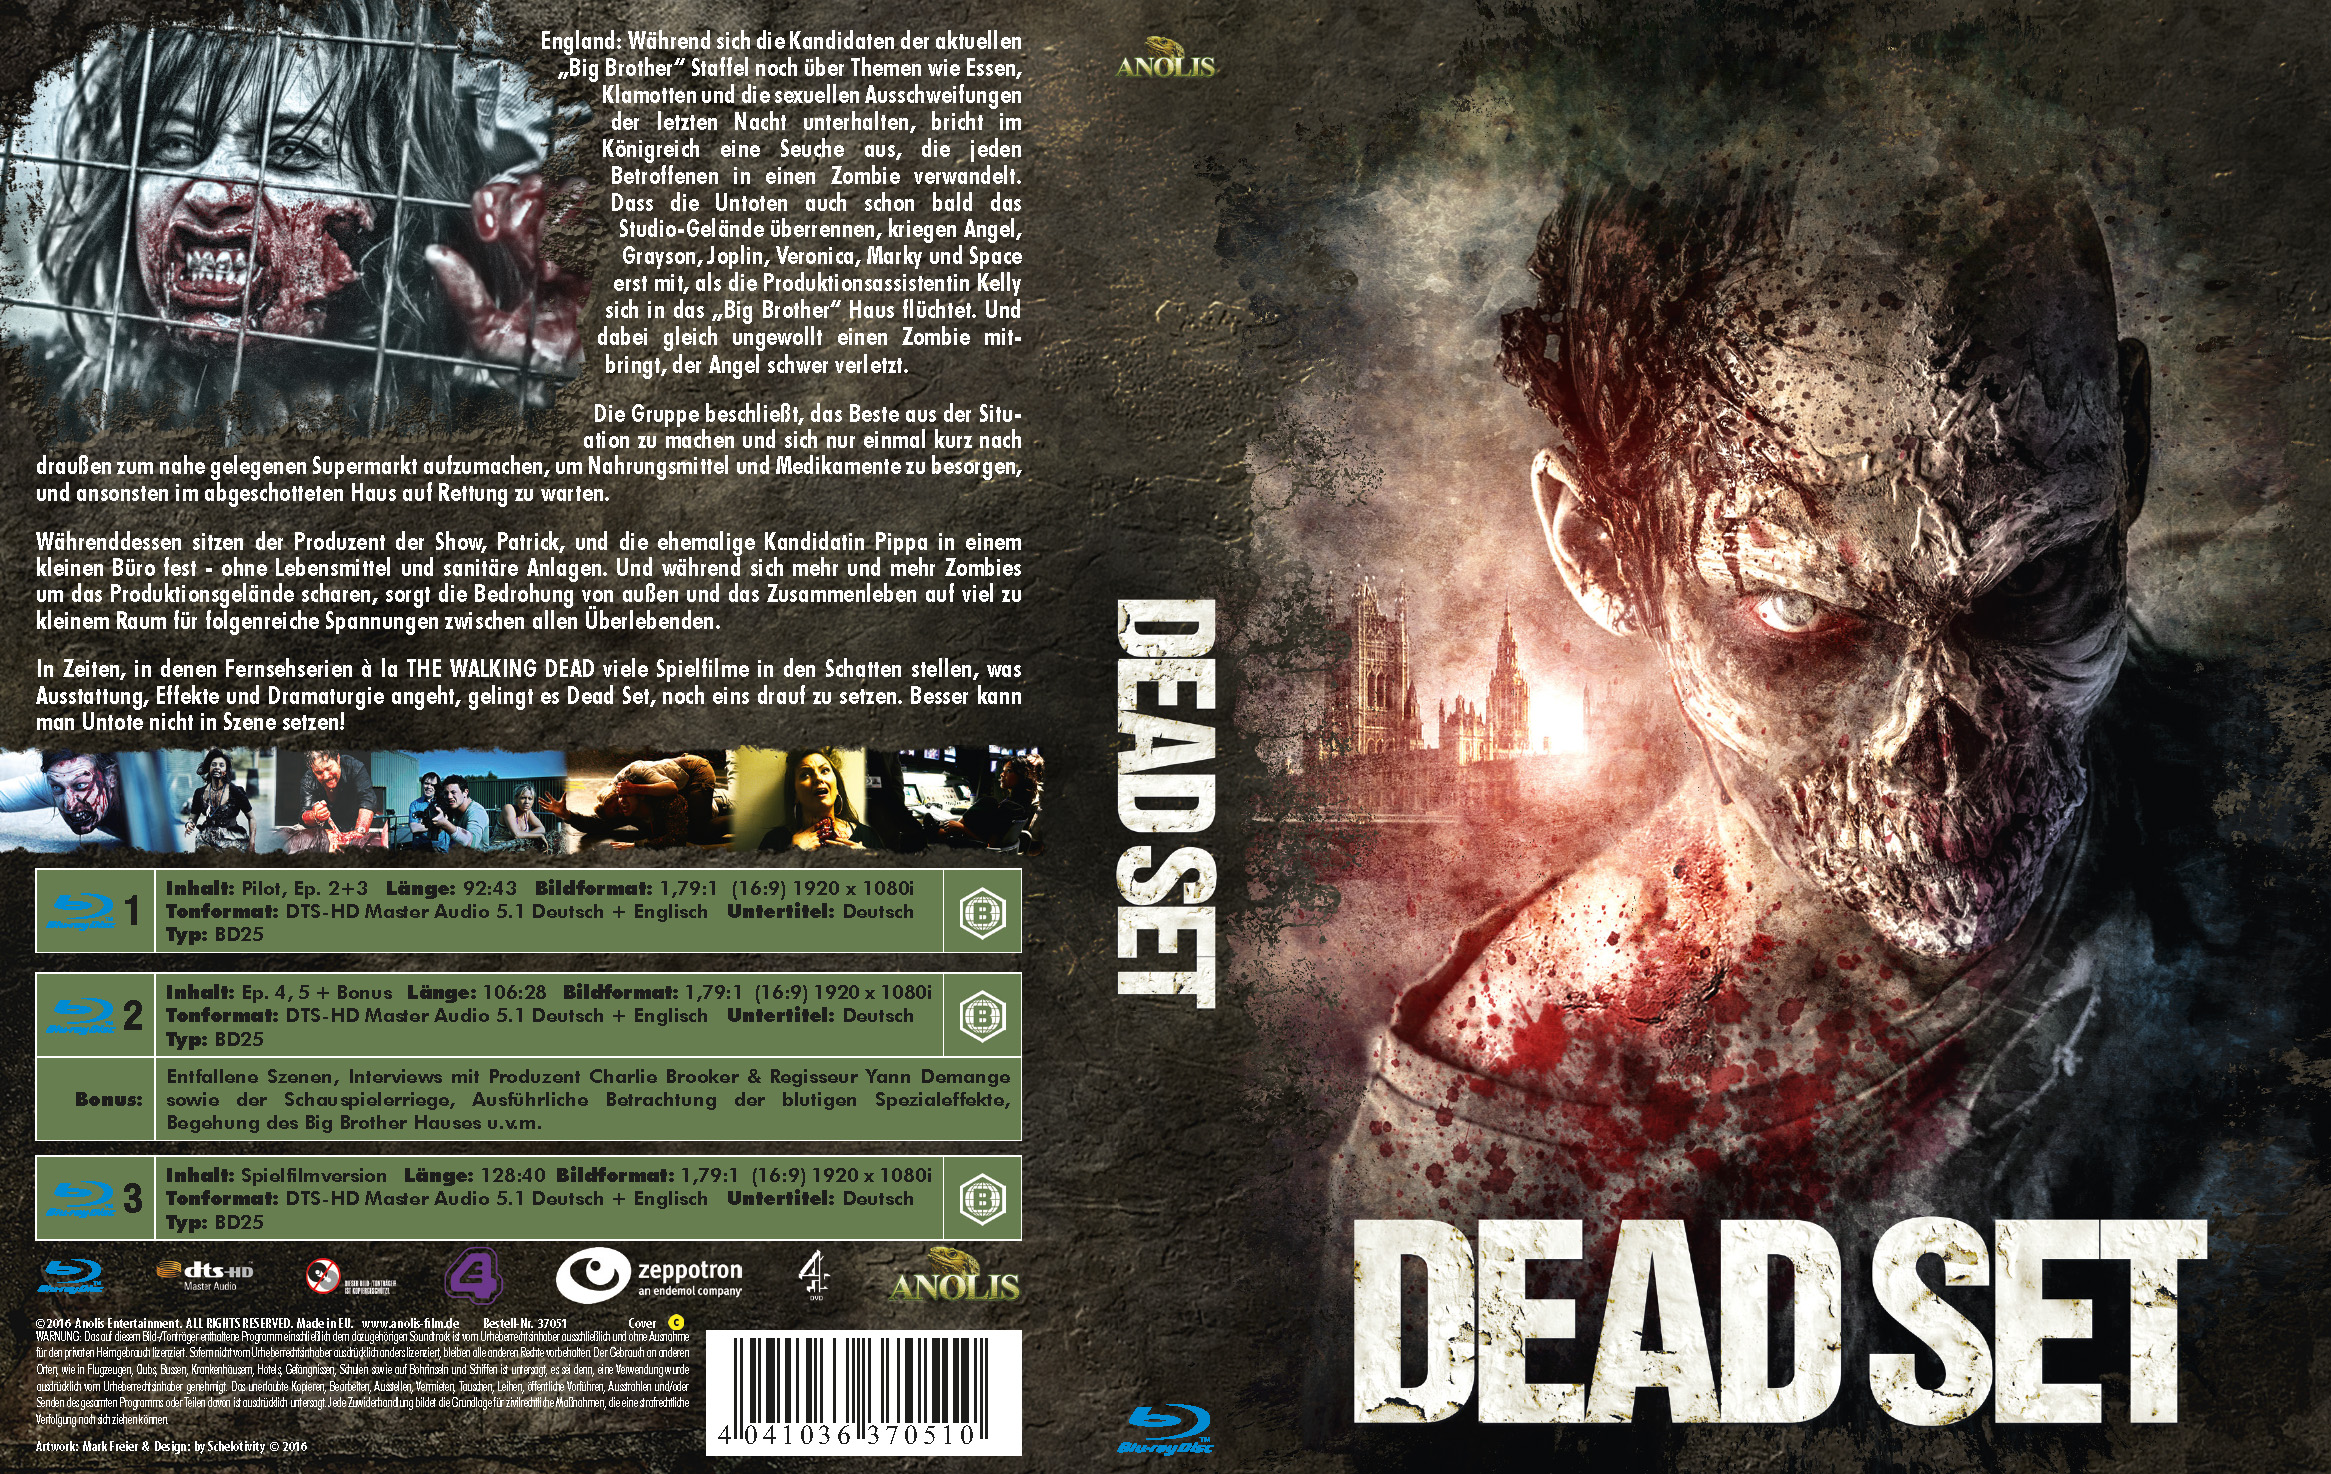 Dead Set (Mediabook Cover C)